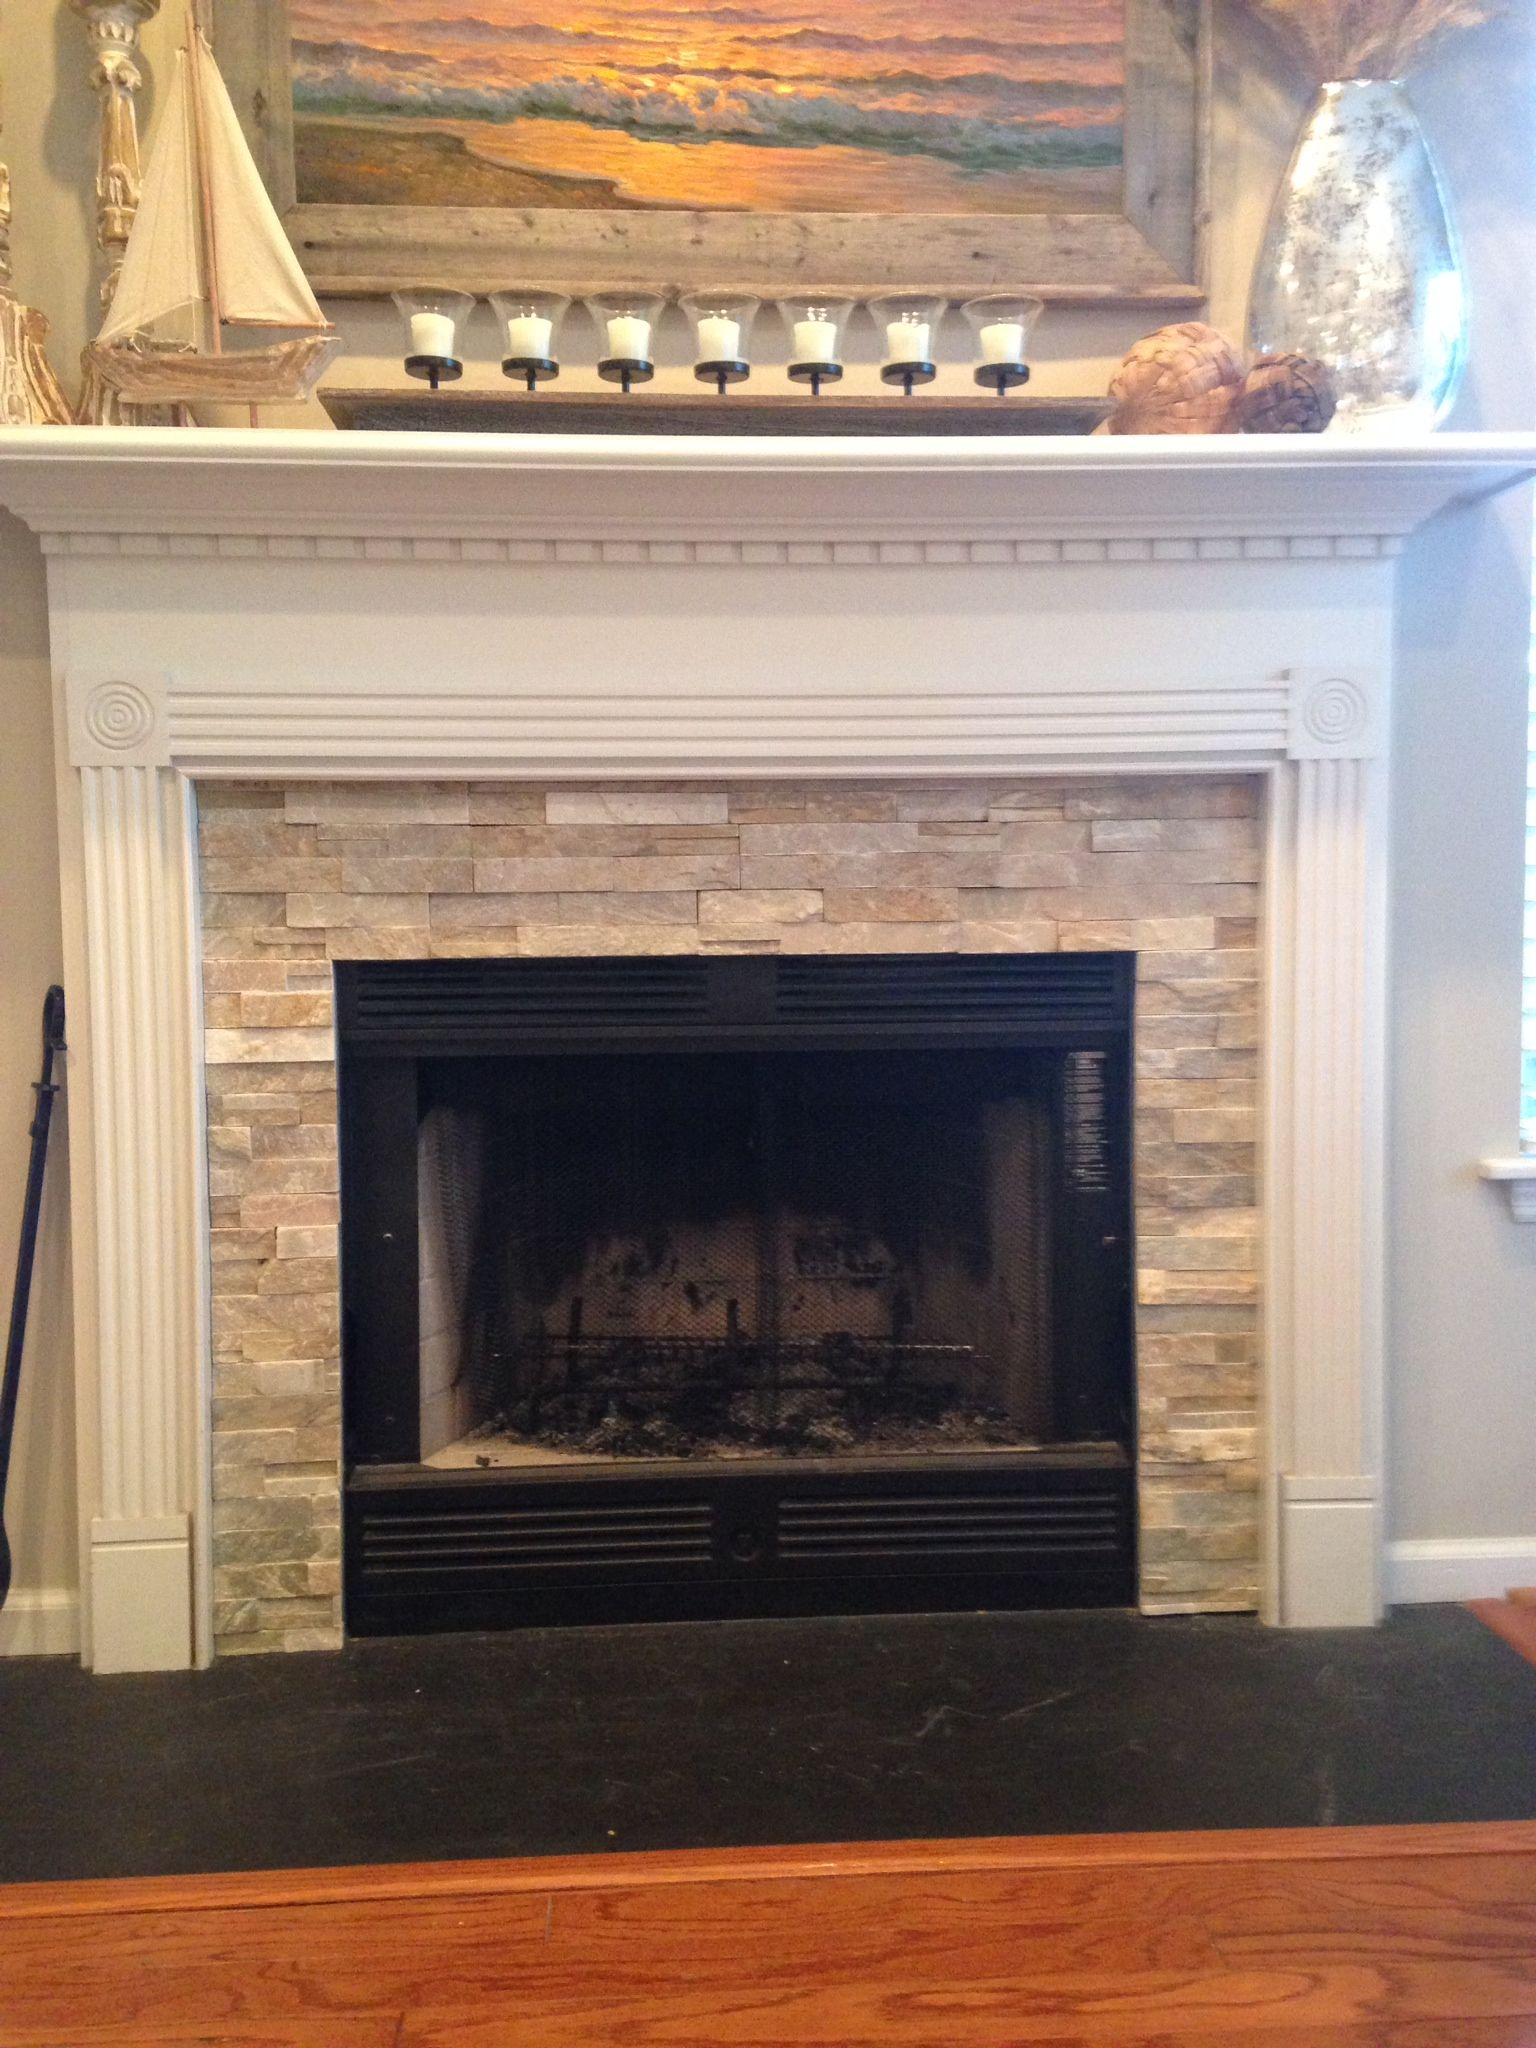 Fireplace Hearth Stone Ideas Best Of Fireplace Idea Mantel Wainscoting Design Craftsman